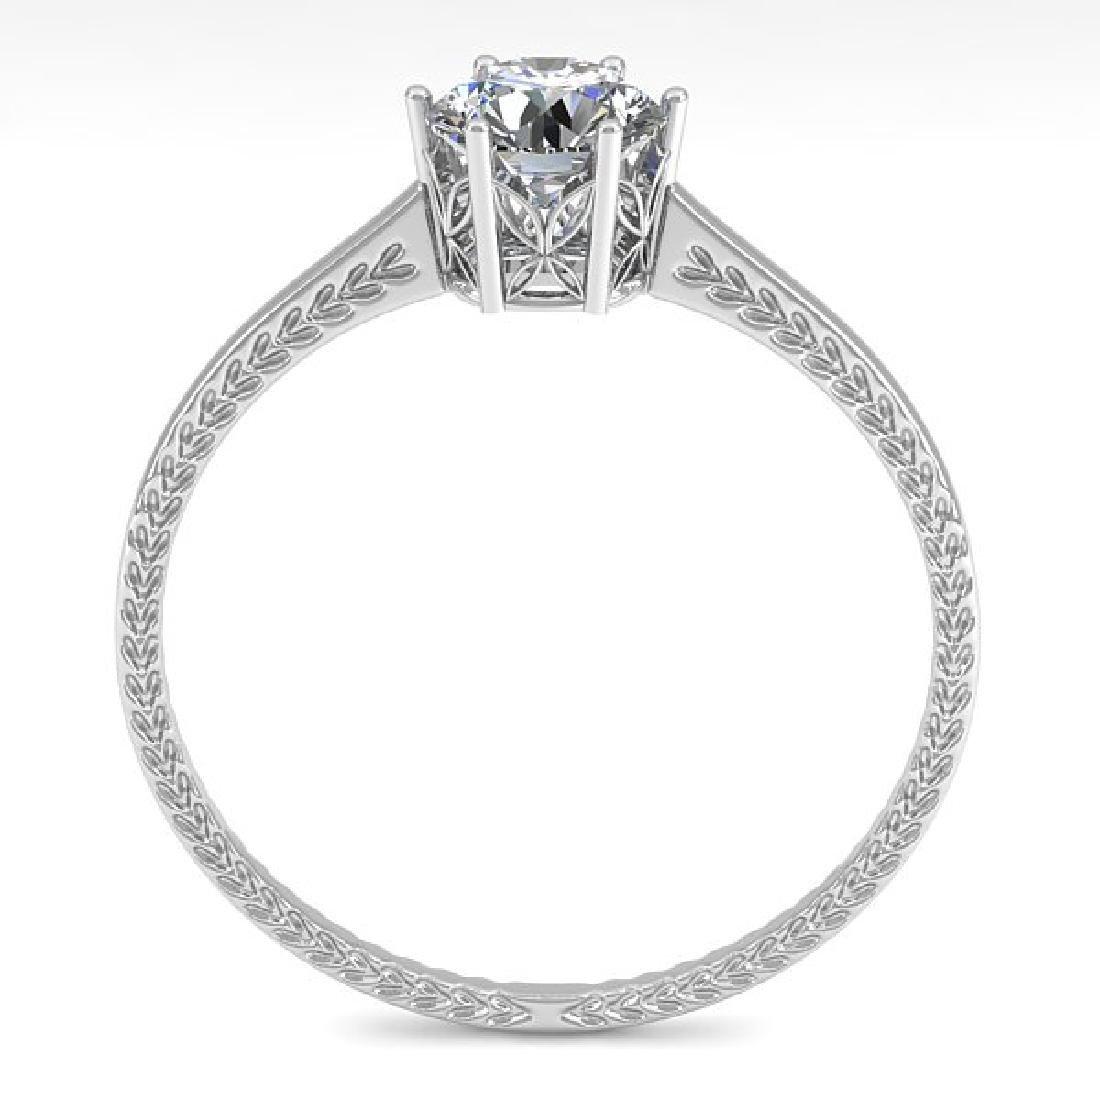 0.51 CTW VS/SI Diamond Art Deco Ring 14K White Gold - 3